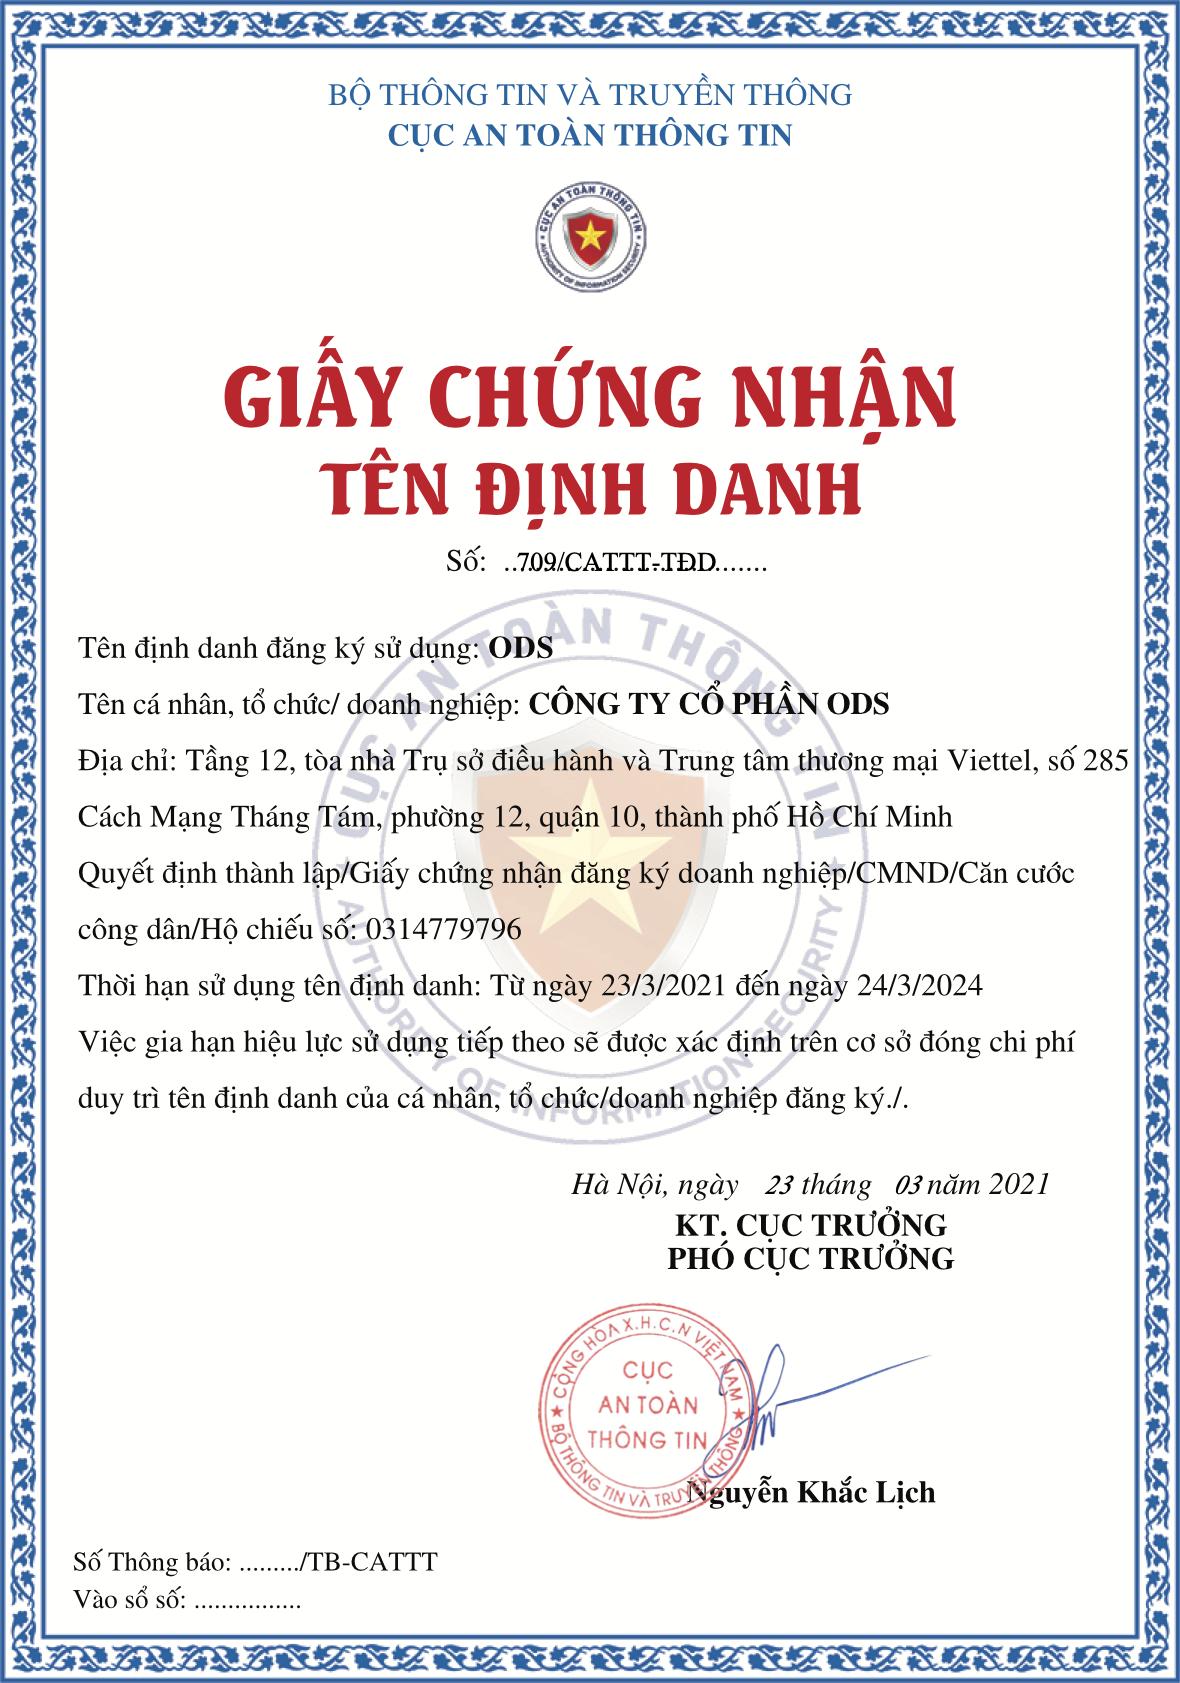 giay-chung-nhan-brandname-3